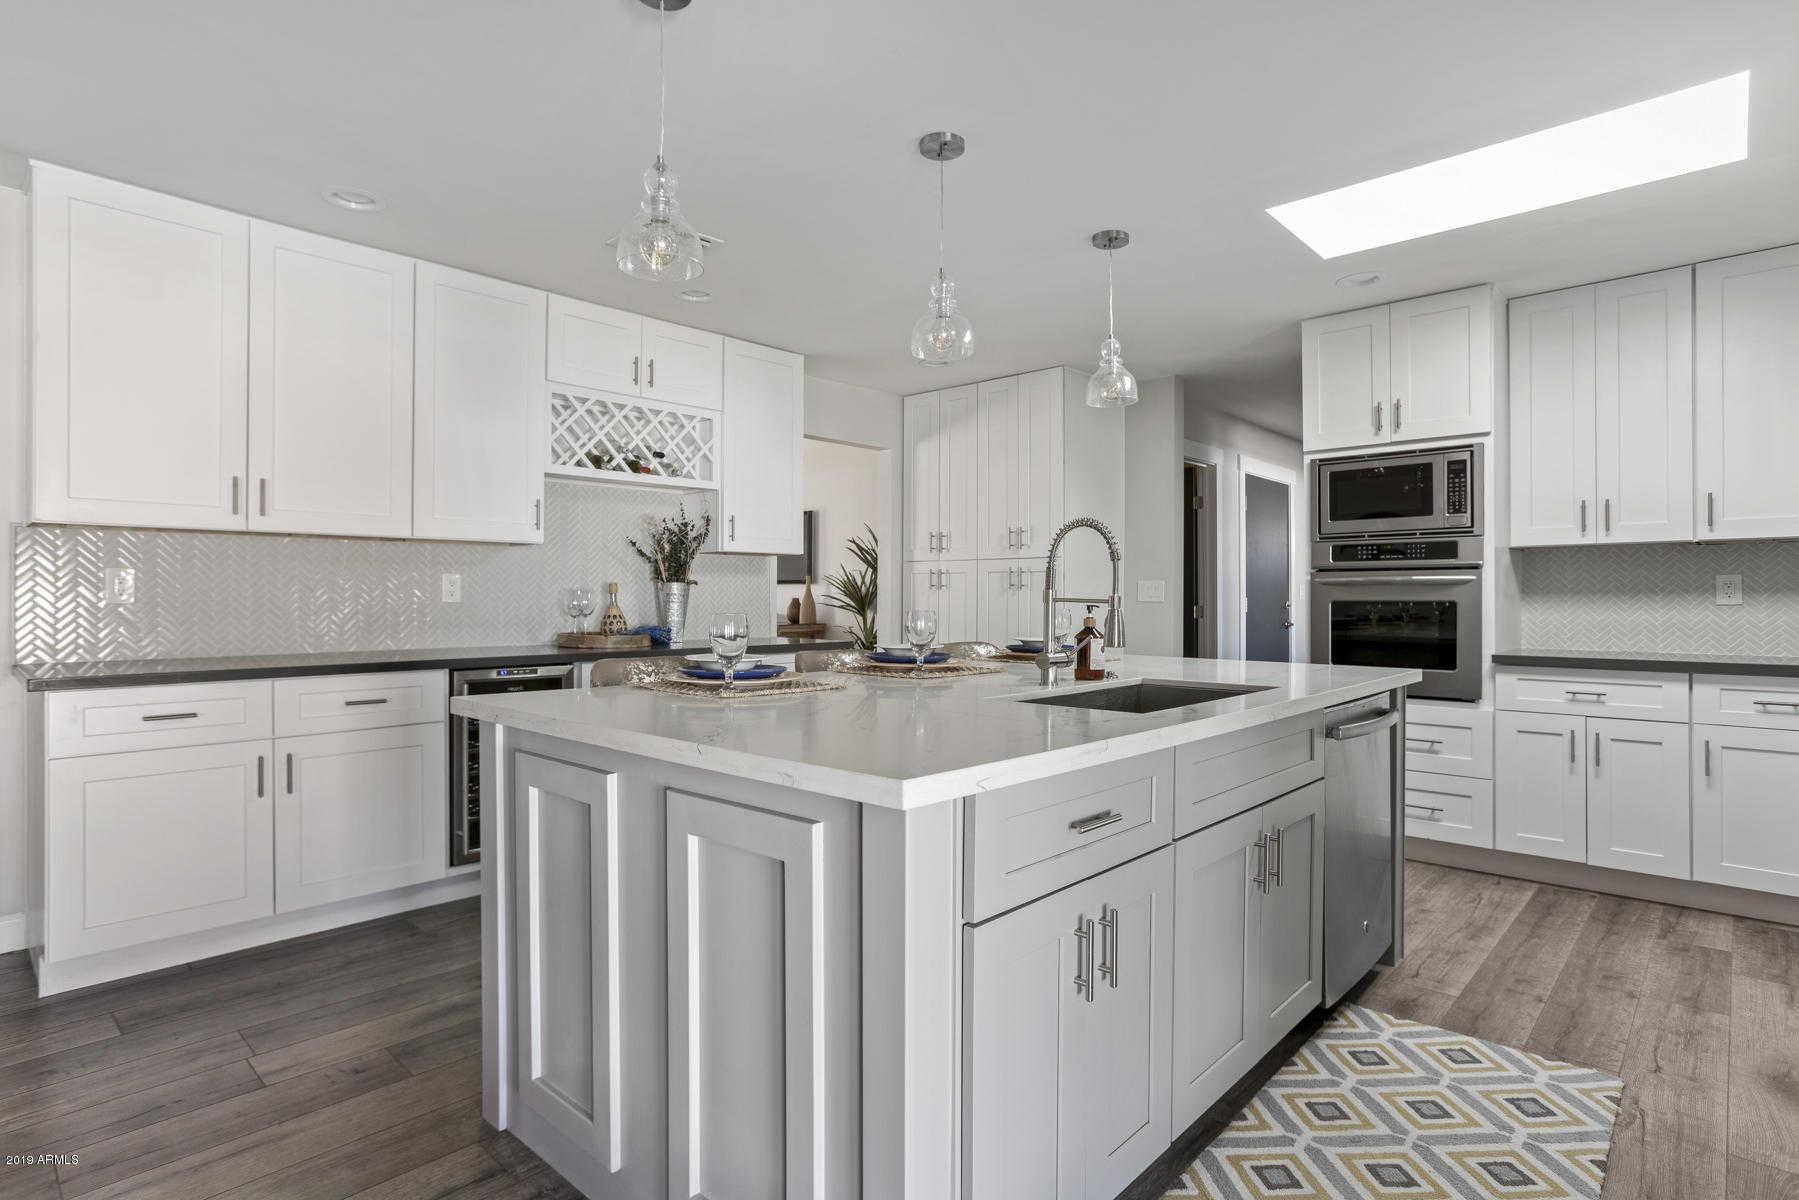 $557,000 - 5Br/4Ba - Home for Sale in Sunburst Farms, Glendale